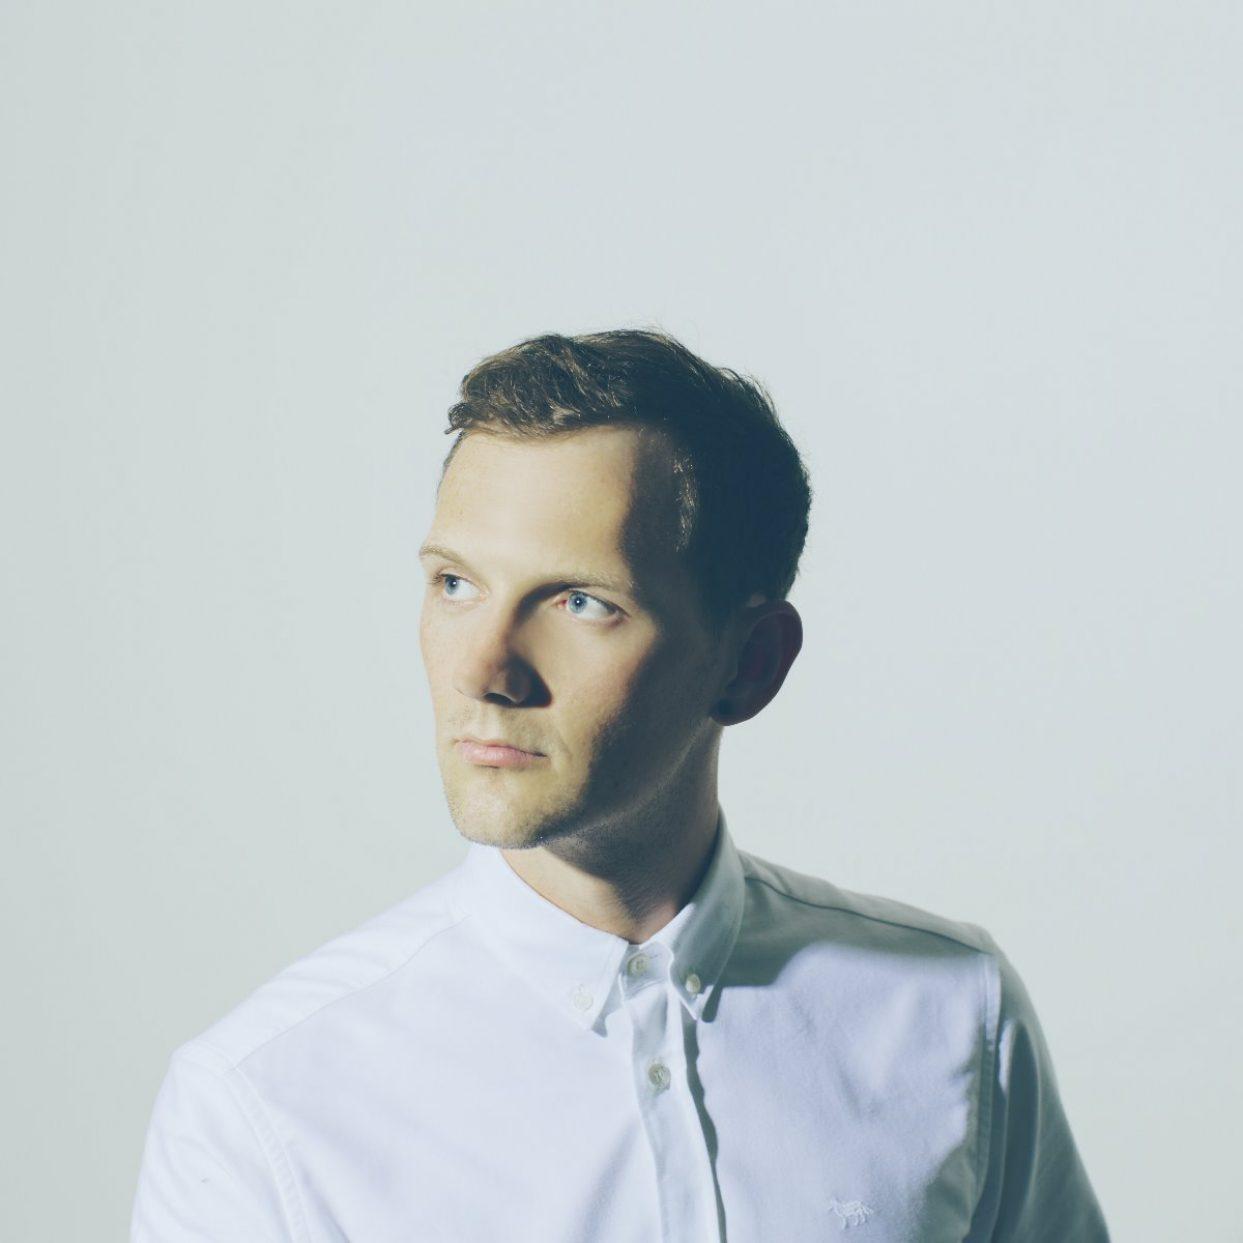 The Kite String Tangle Announces Debut Album